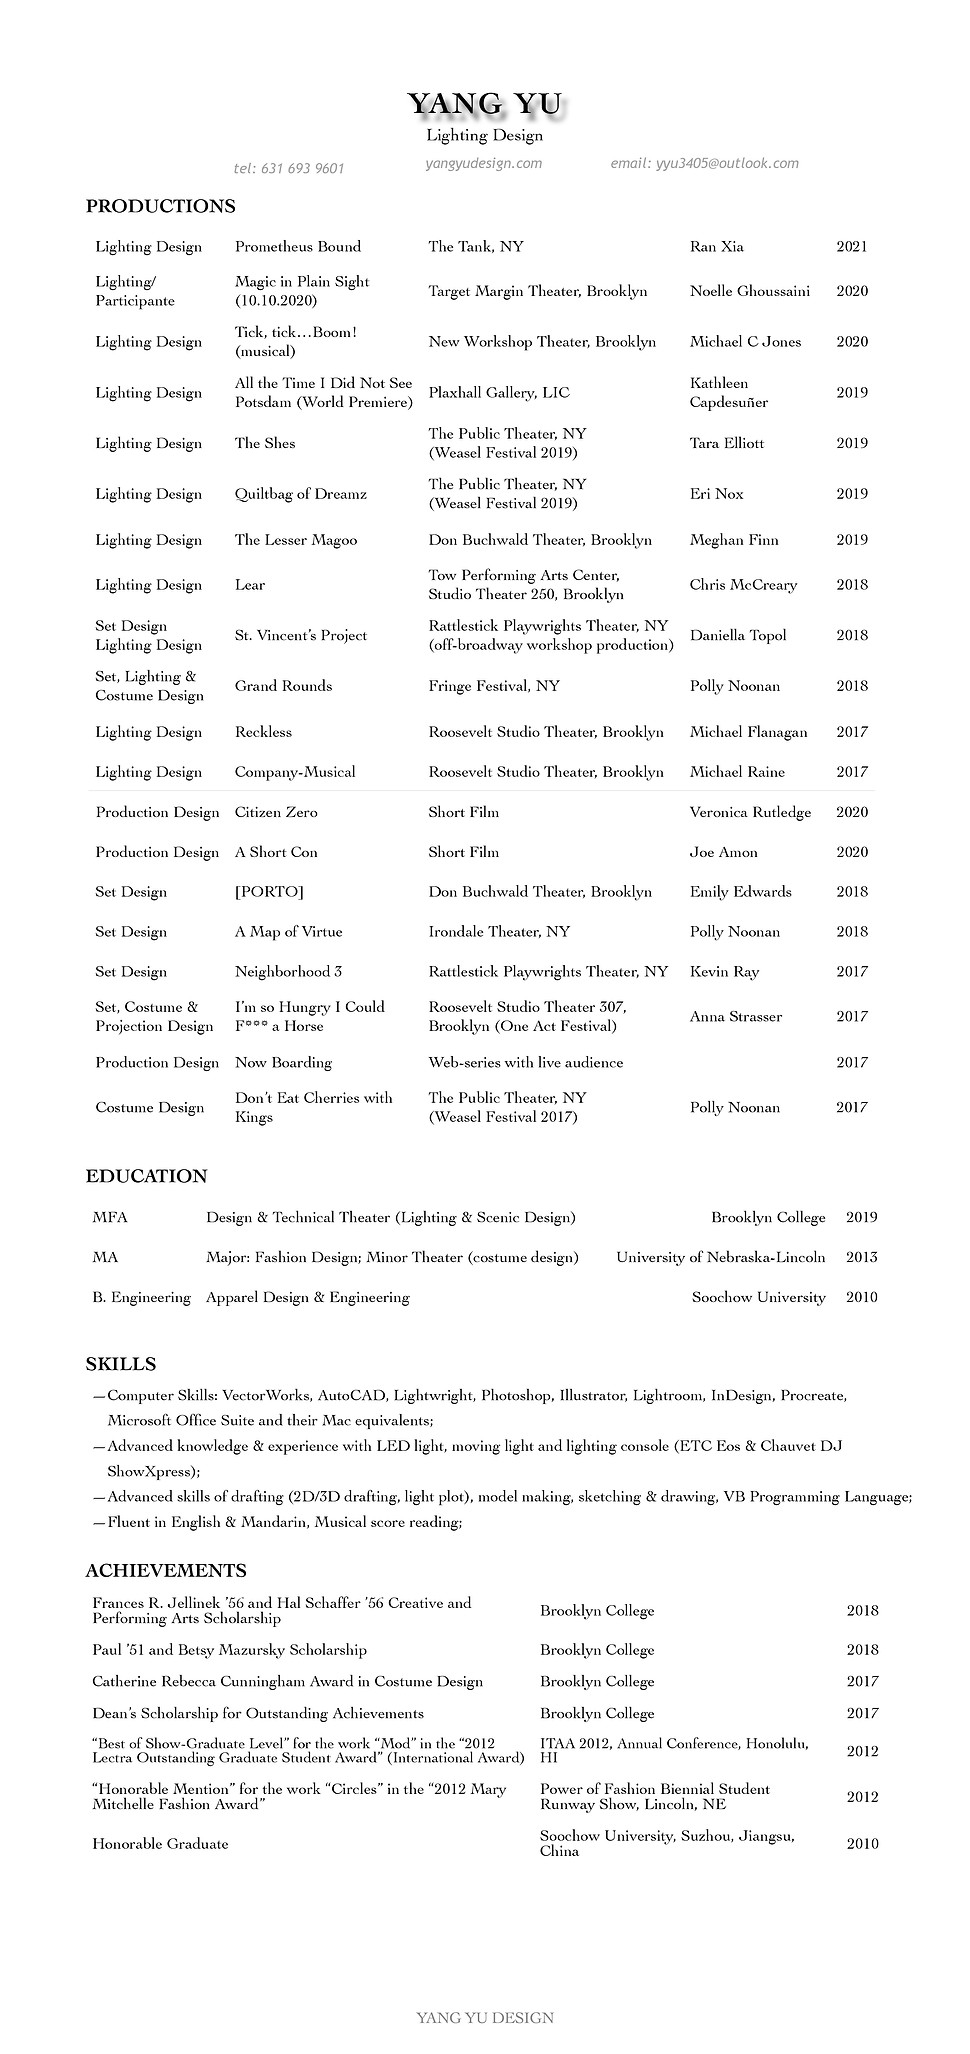 Resume-Yang Yu.jpg